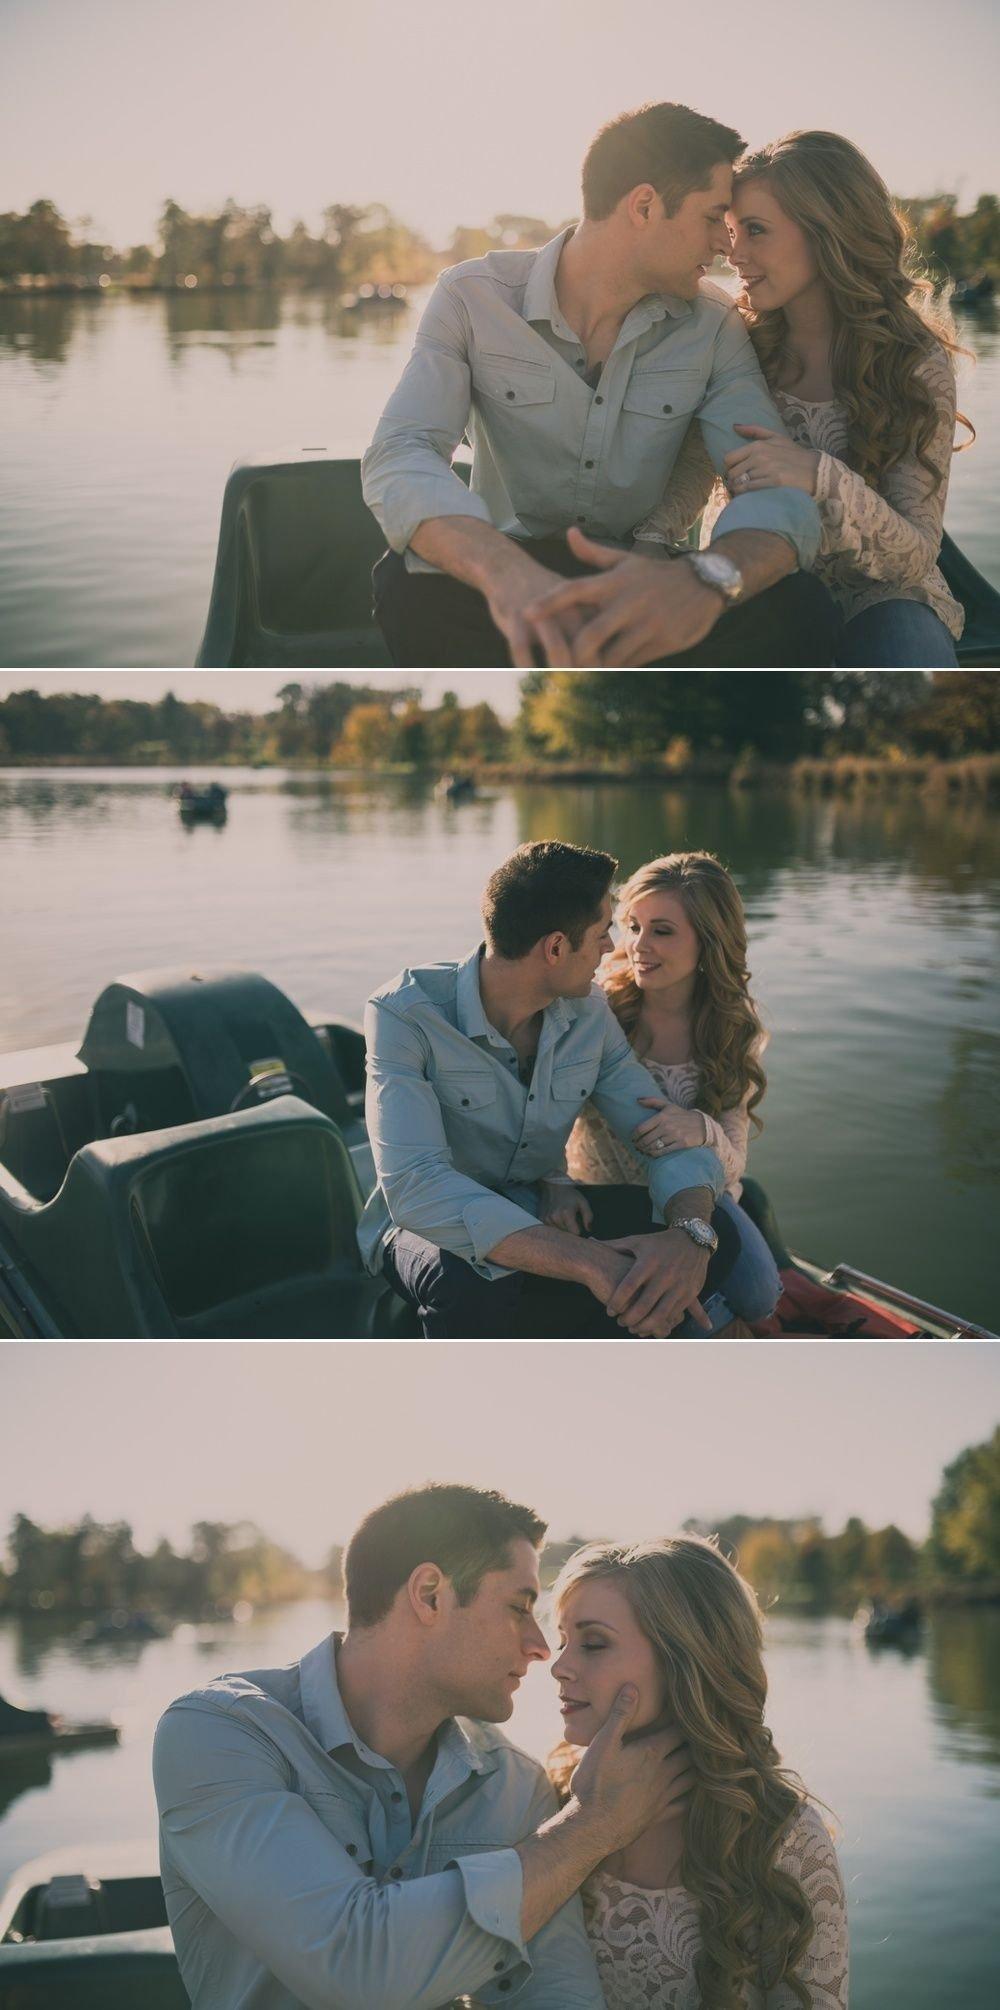 romantic engagement photos - st. louis wedding photography